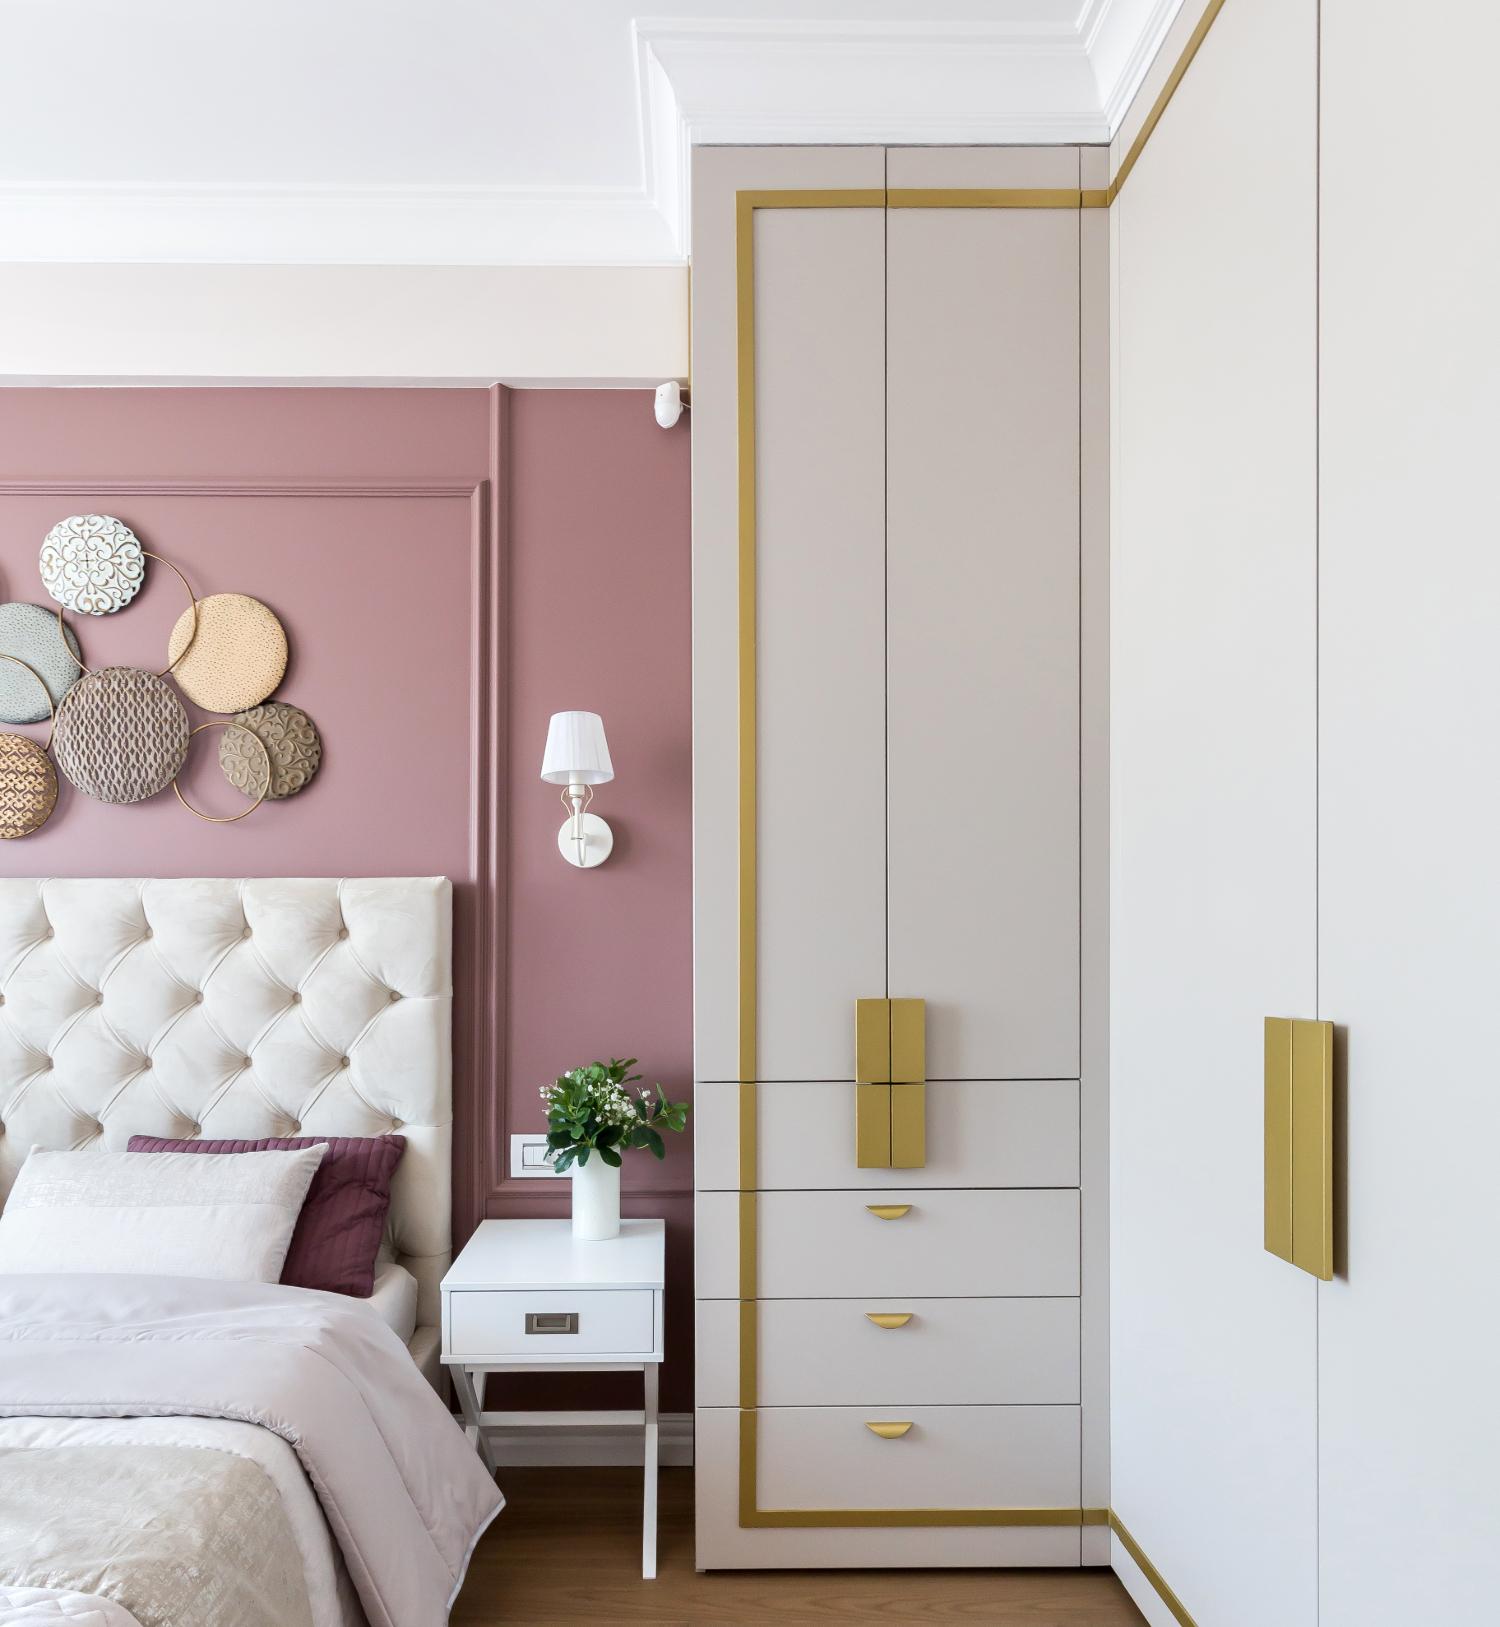 Amenajare elegantă dormitor cu roz și alb. Acasă la Natalia Berezovskaia - Creativ Interior - The Famous Design (2)